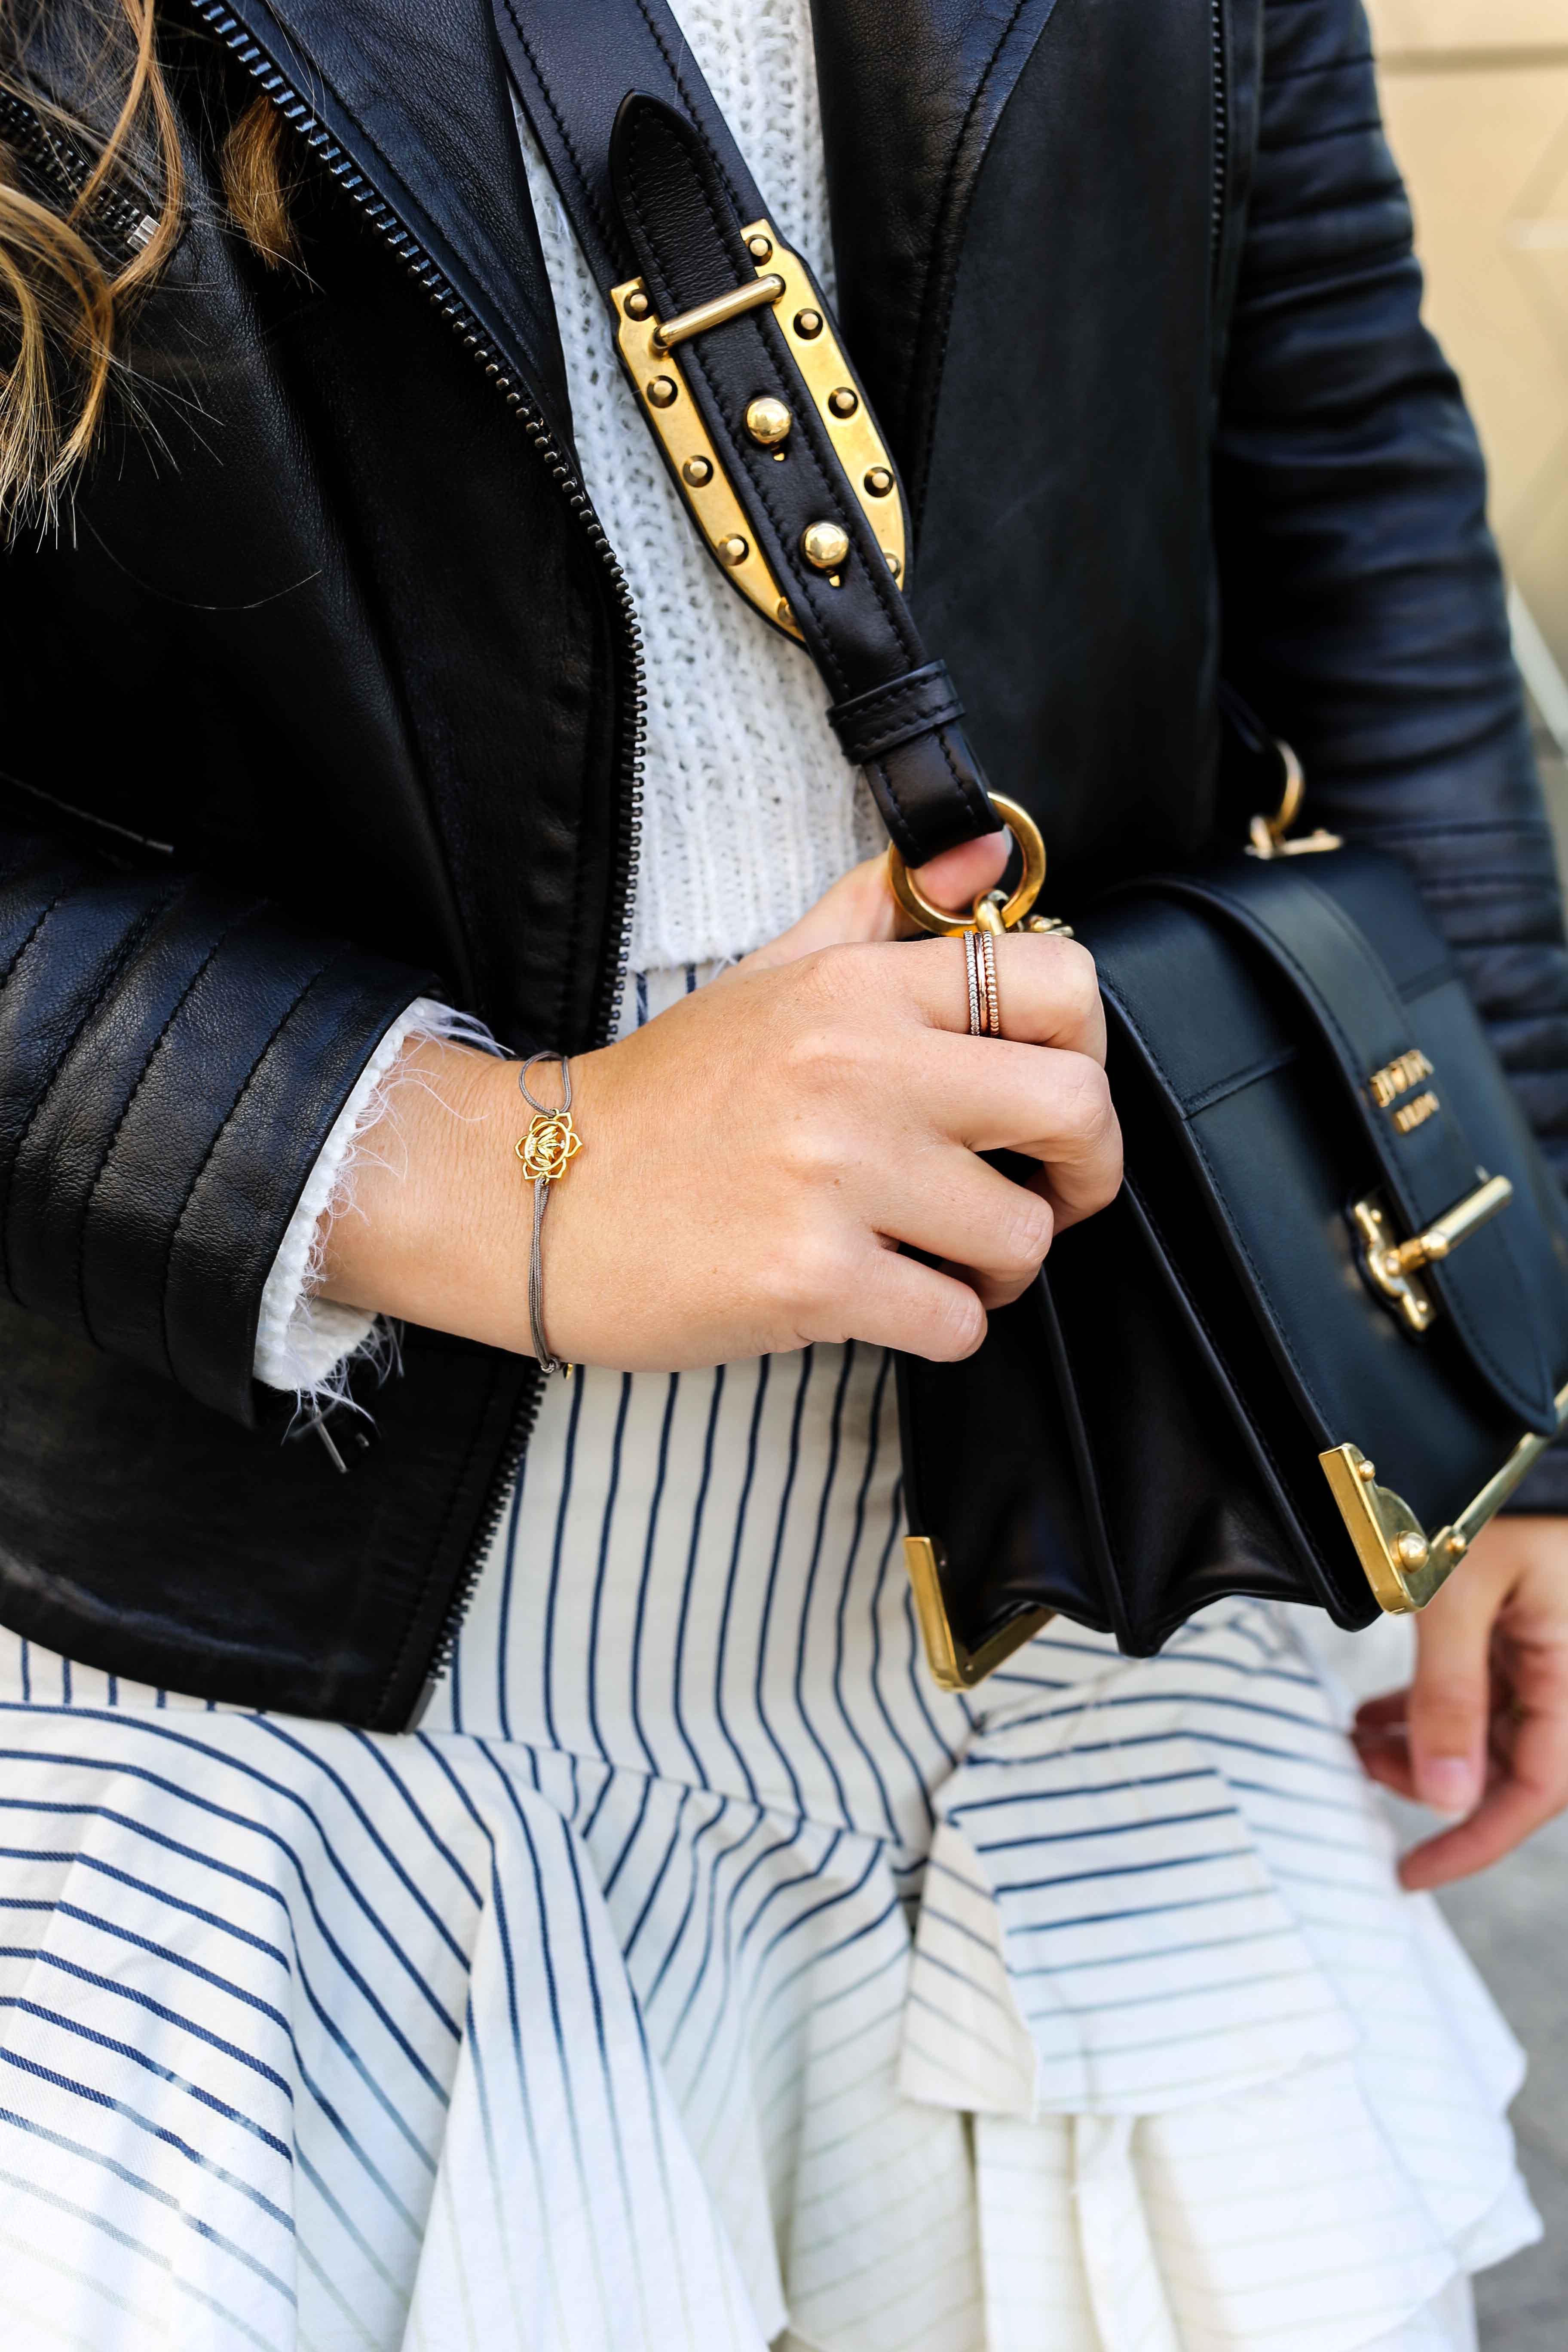 Fashion Week Outfit Berlin Prada Cahier Bag schwarz Thomas Sabo ringe gold Lederjacke Streetstyle Modeblog 4